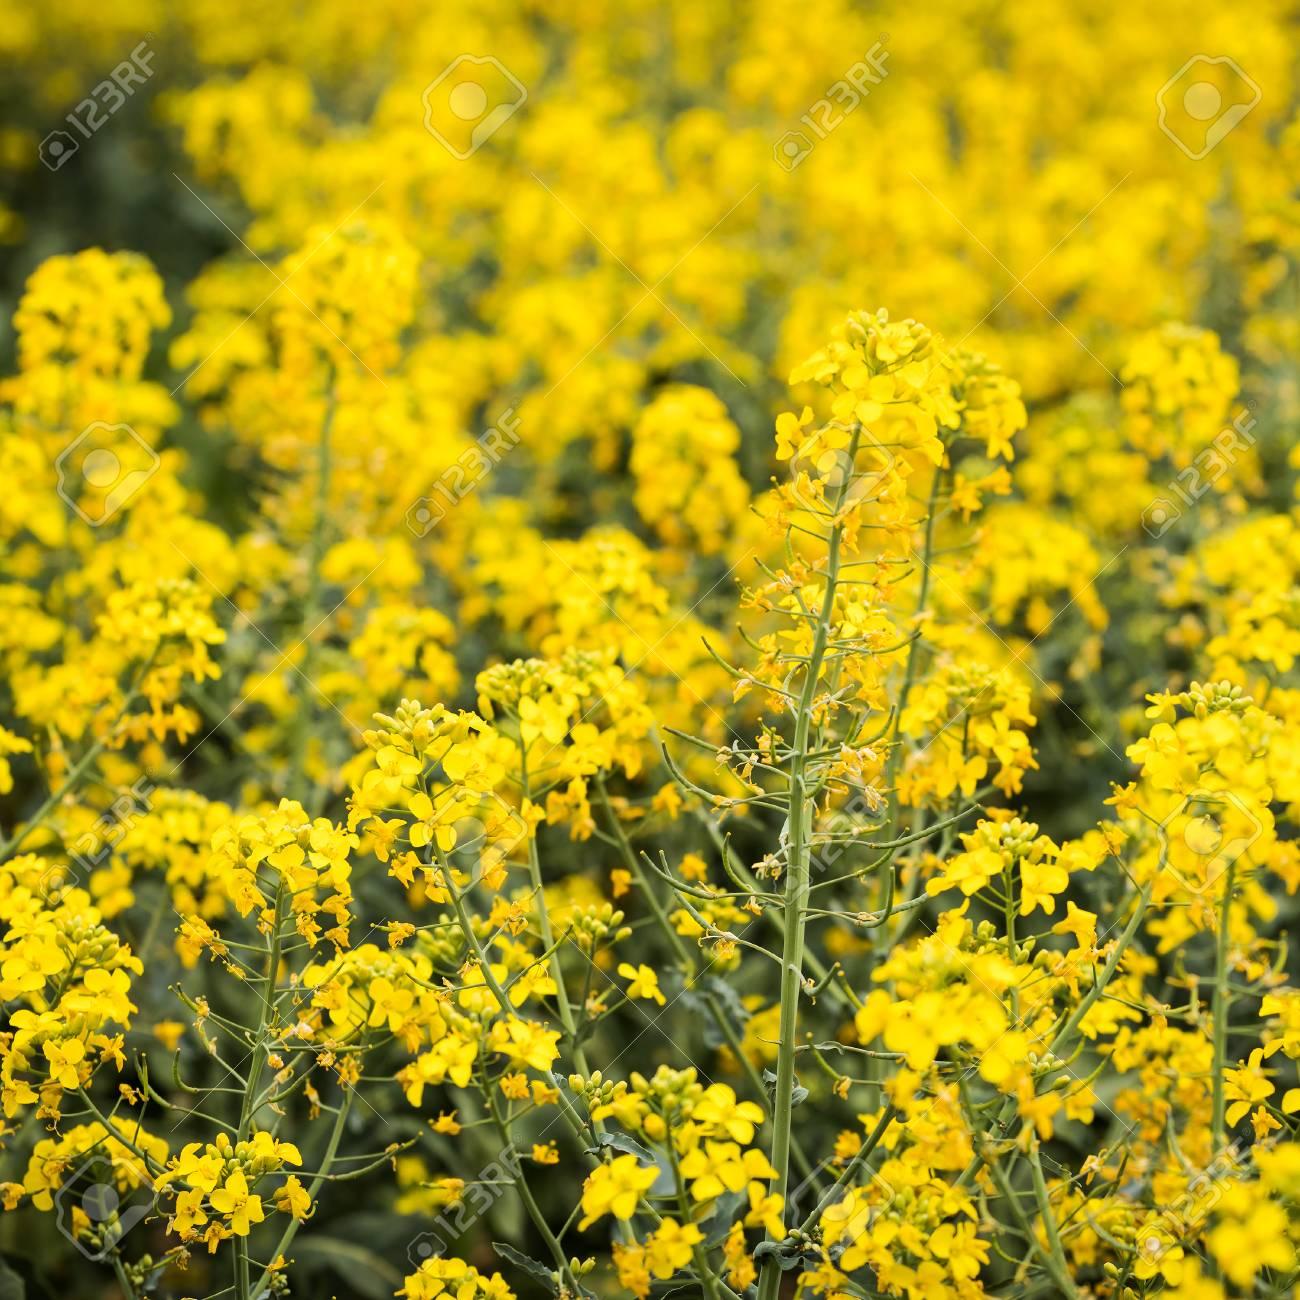 Yellow rapeseed field with bright yellow flowers on dark green stock photo yellow rapeseed field with bright yellow flowers on dark green stems mightylinksfo